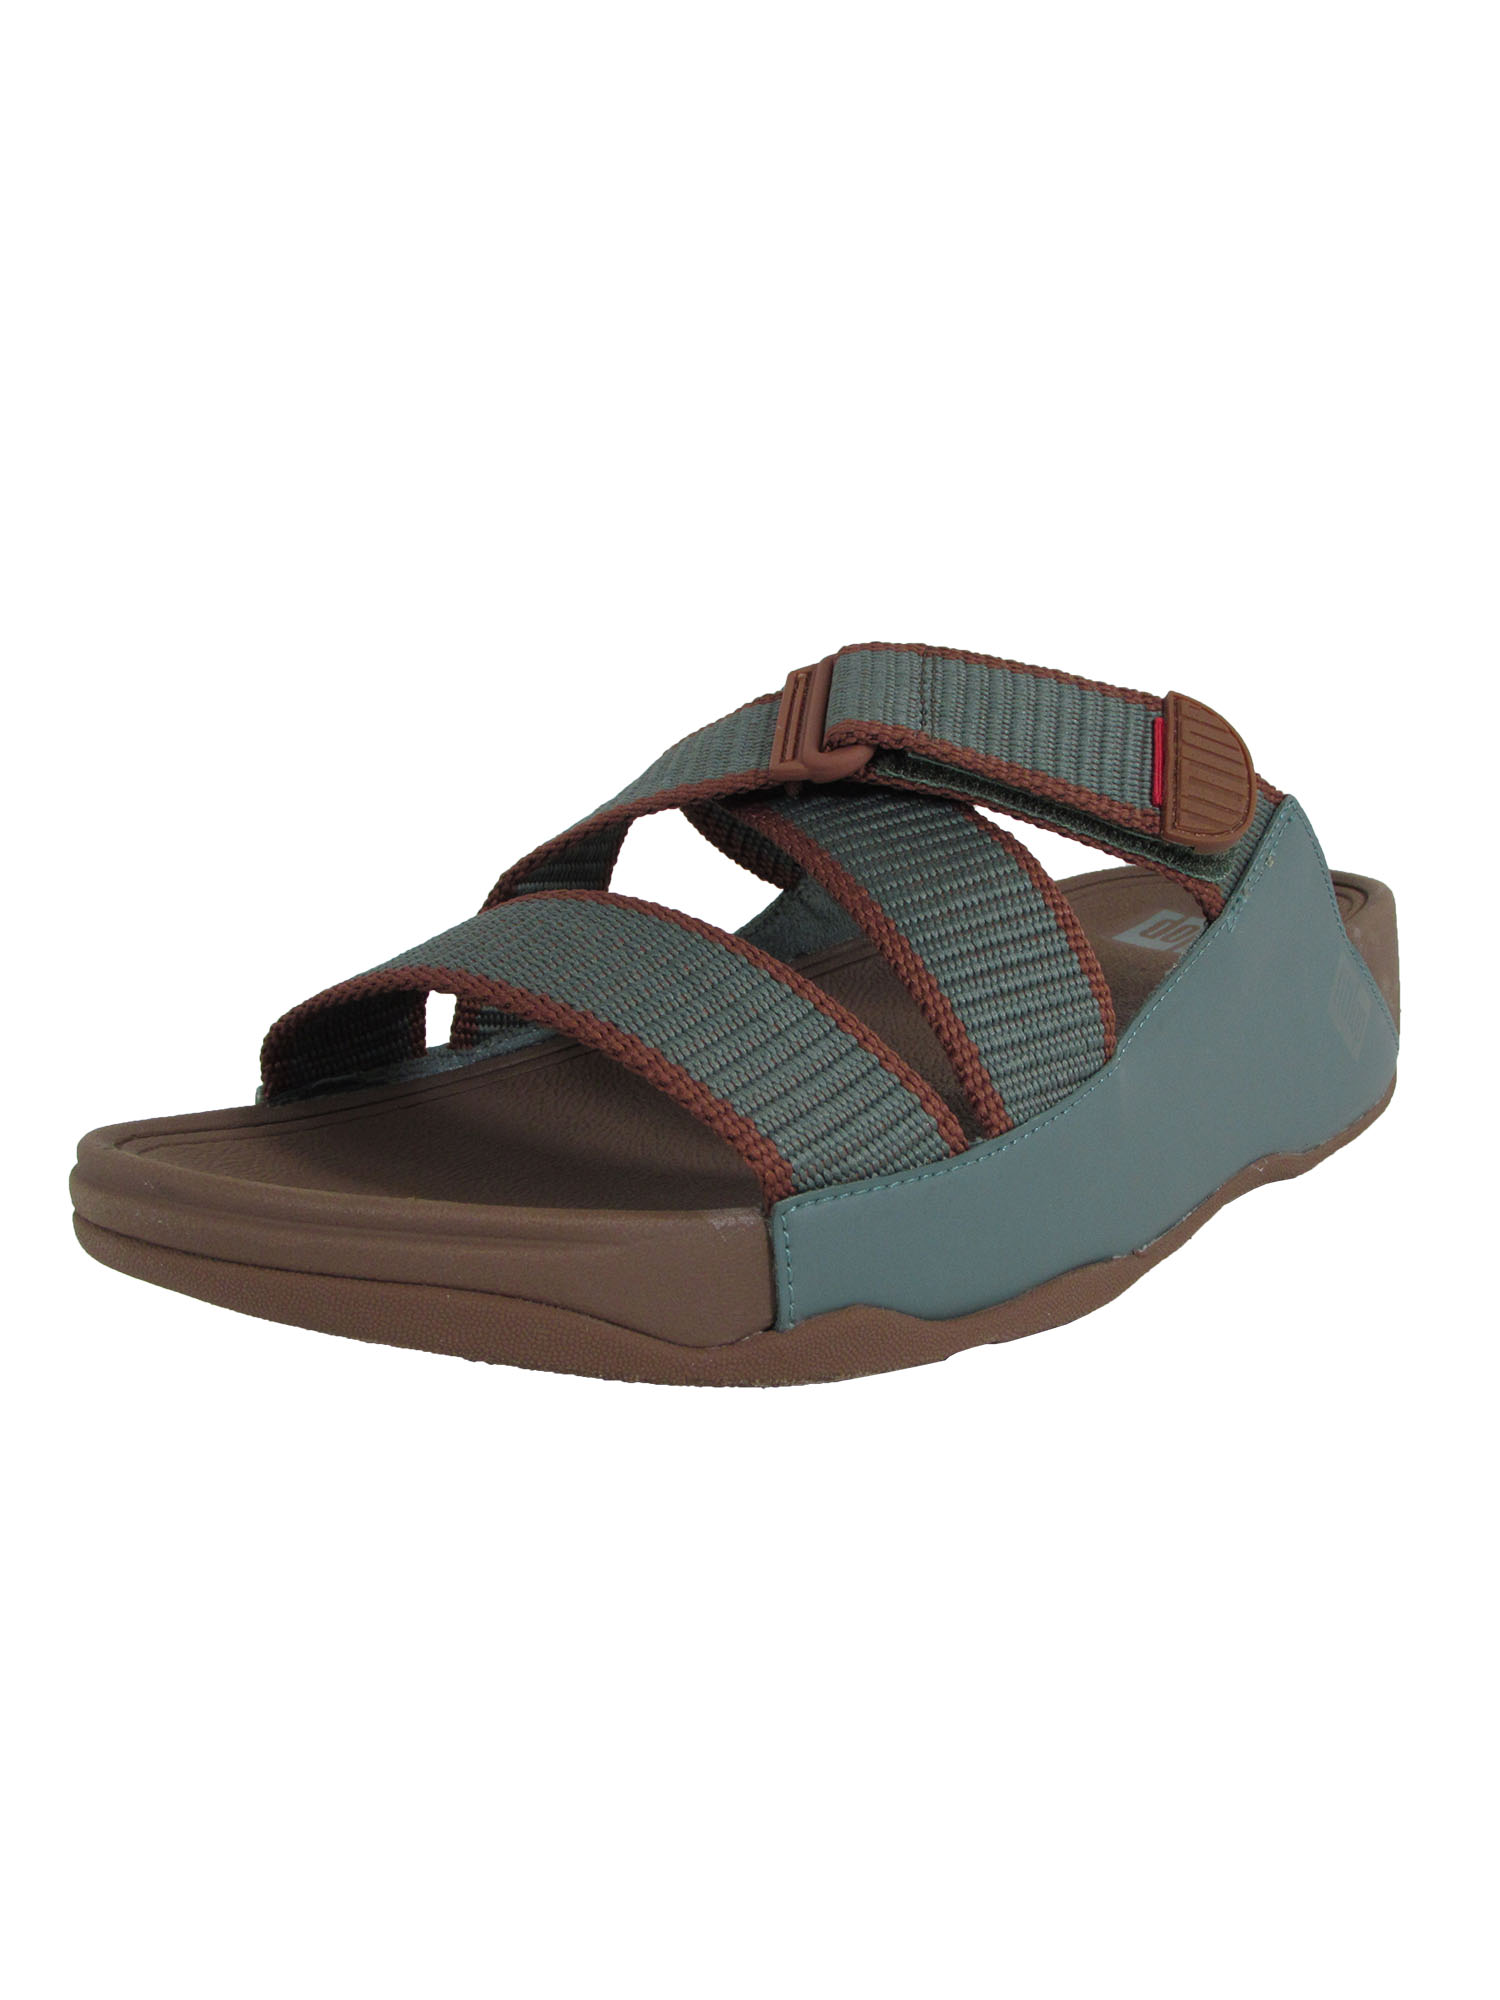 Fitflop-Mens-Sling-II-Webbing-Slide-Sandal-Shoes thumbnail 2